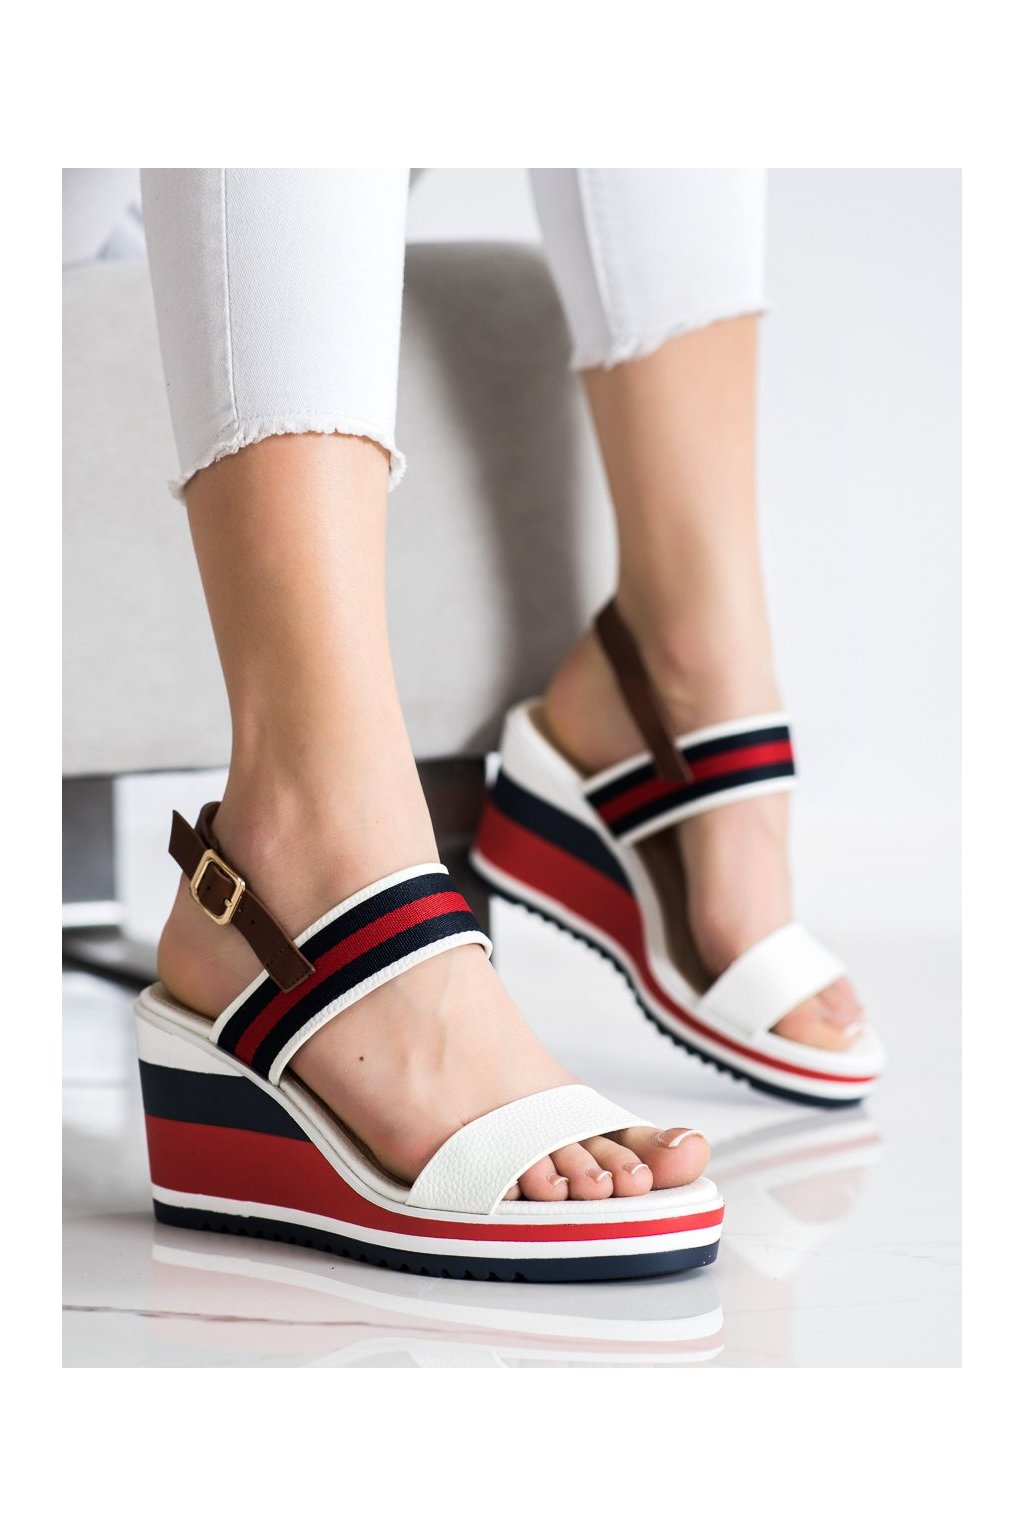 Viacfarebné sandále Filippo kod DS2094/21W/N